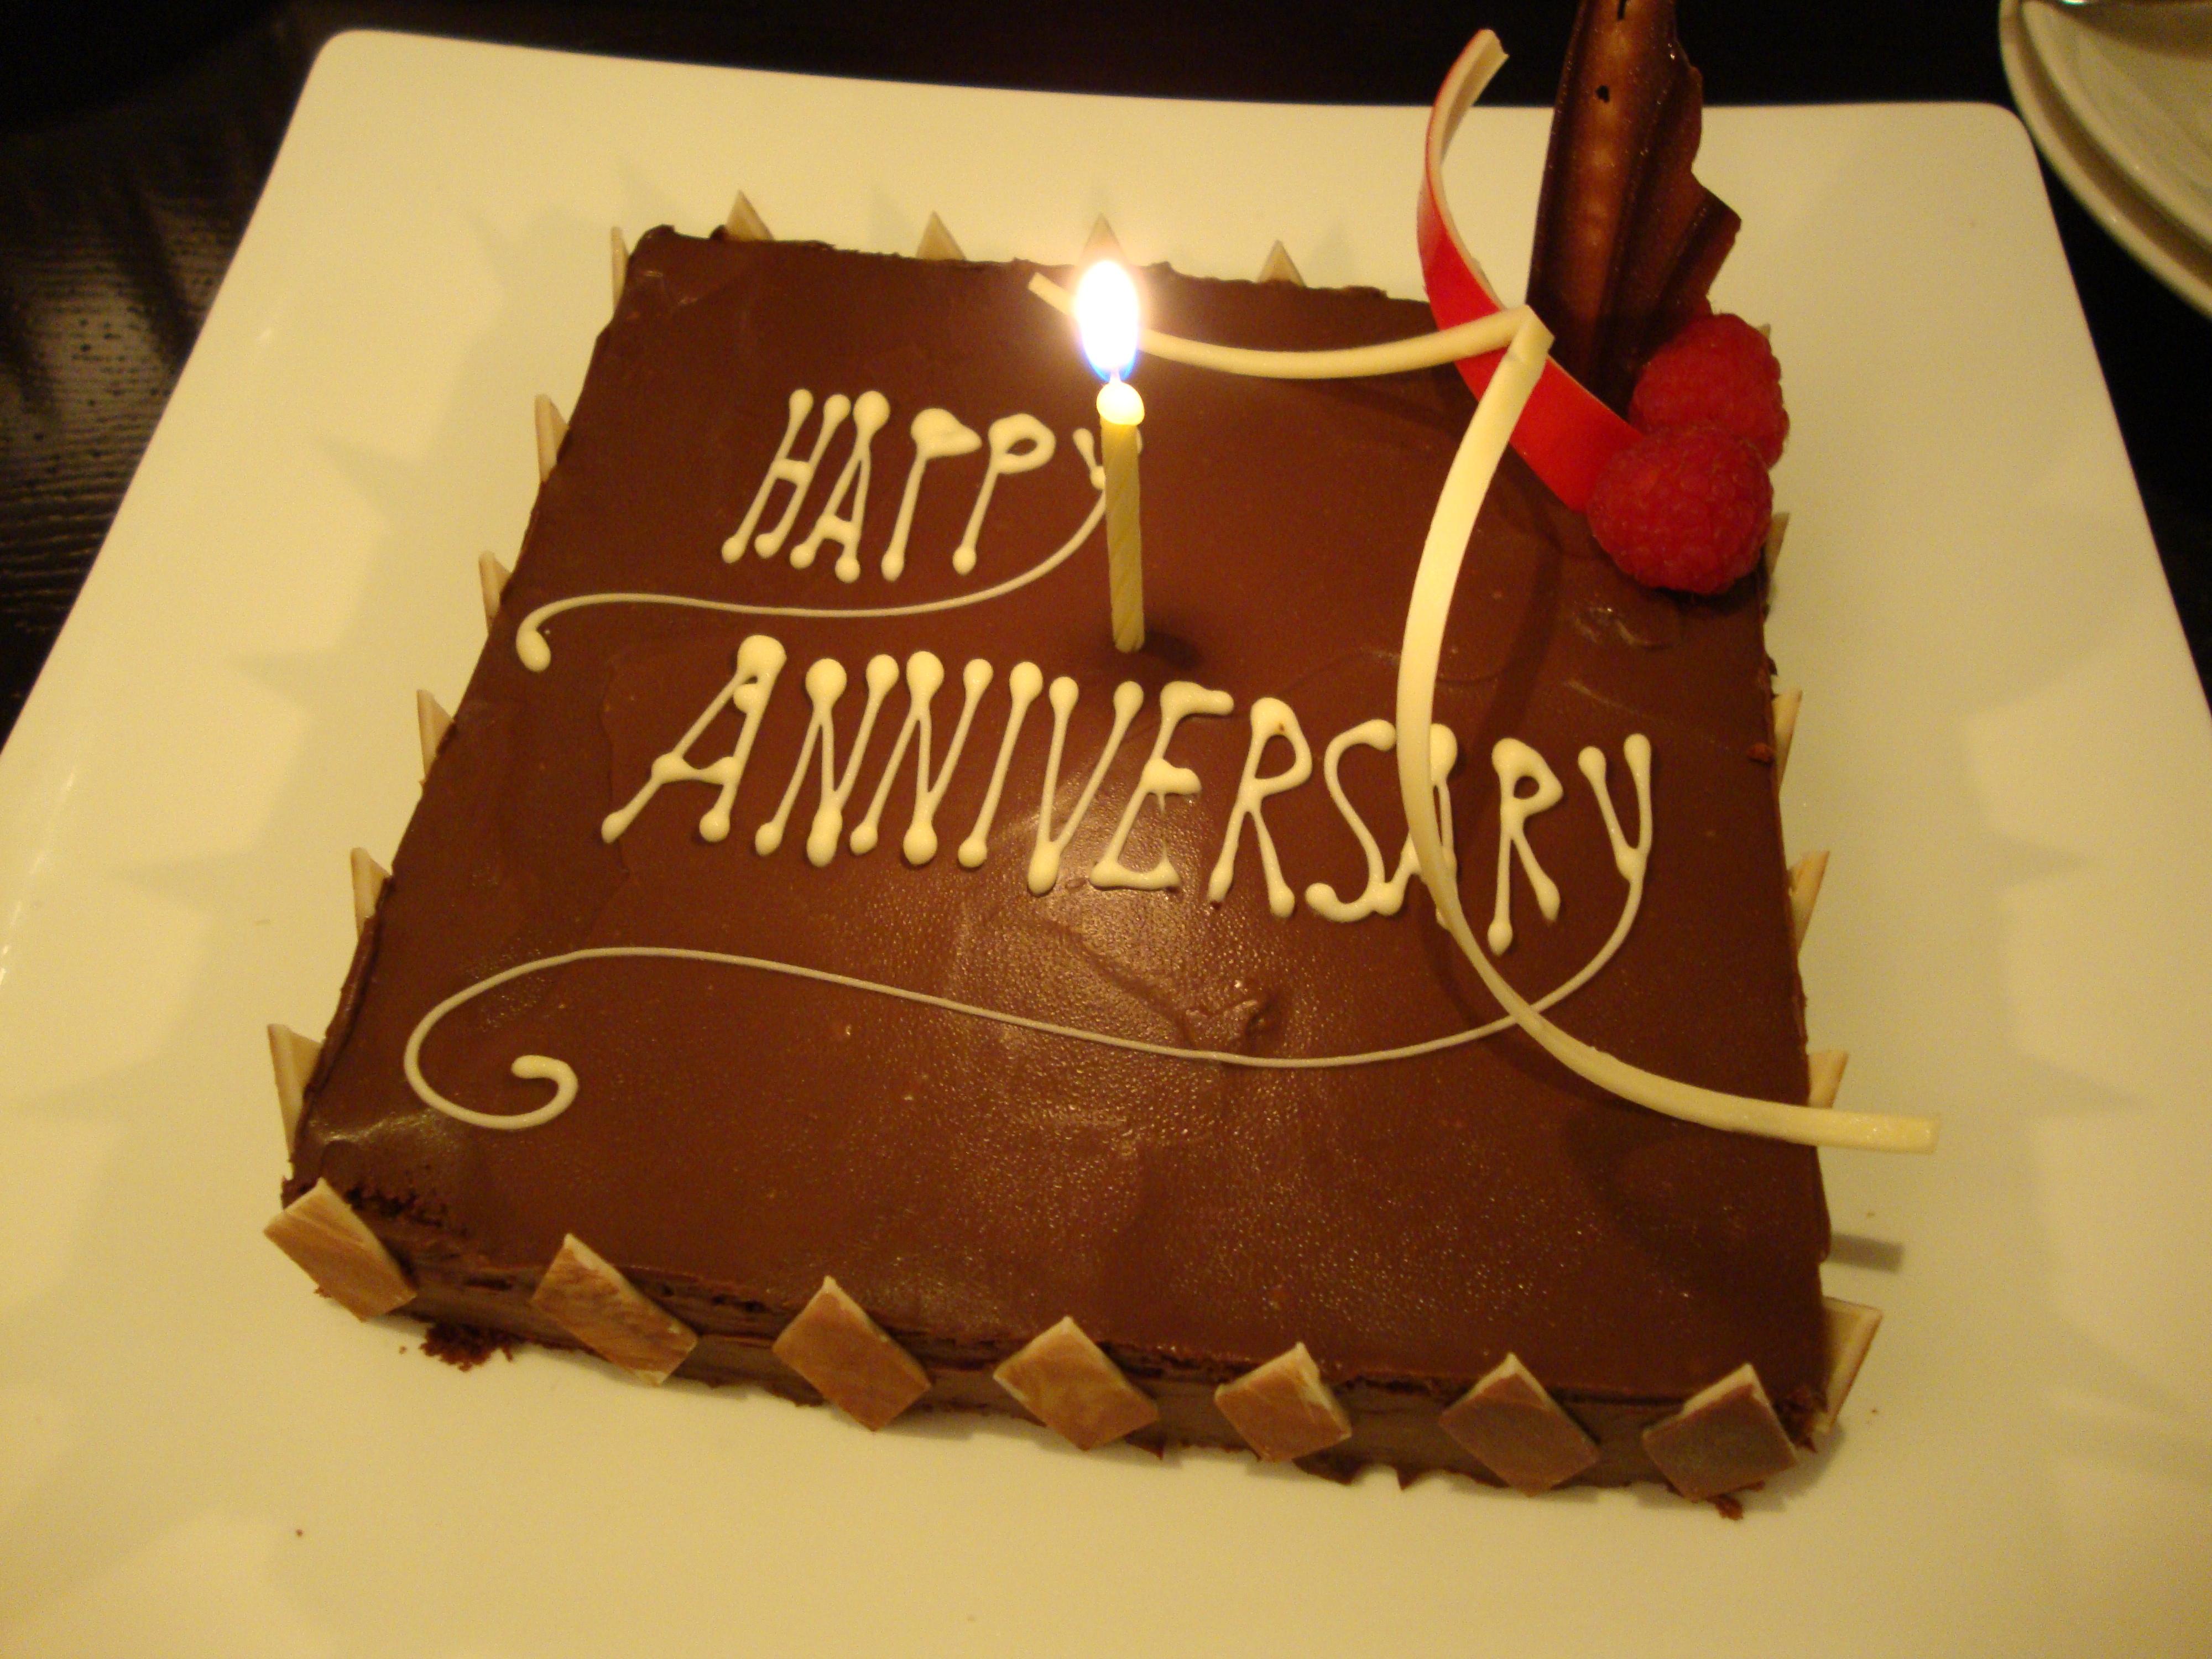 Chocolates cakes and celebrations